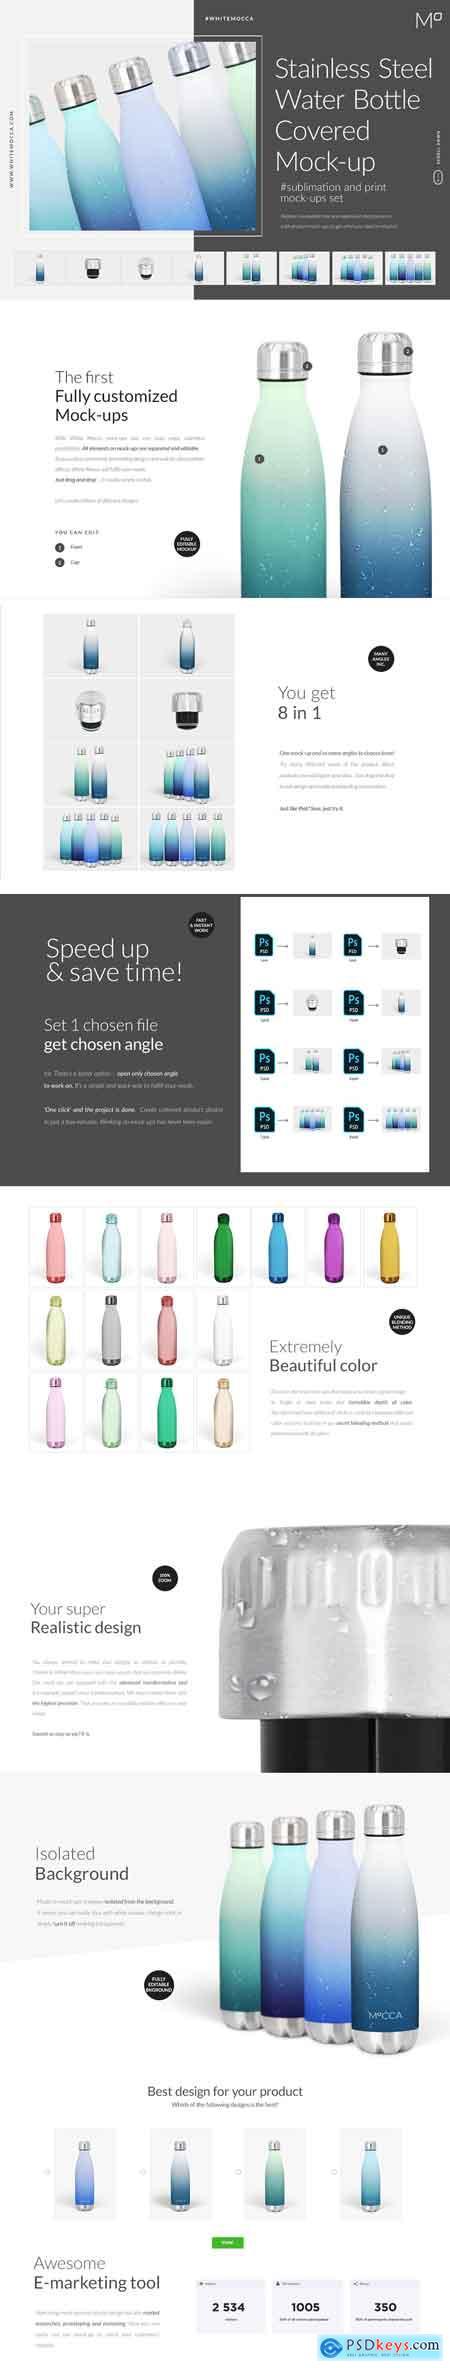 CreativeMarket Stainless Steel Water Bottle Mockup